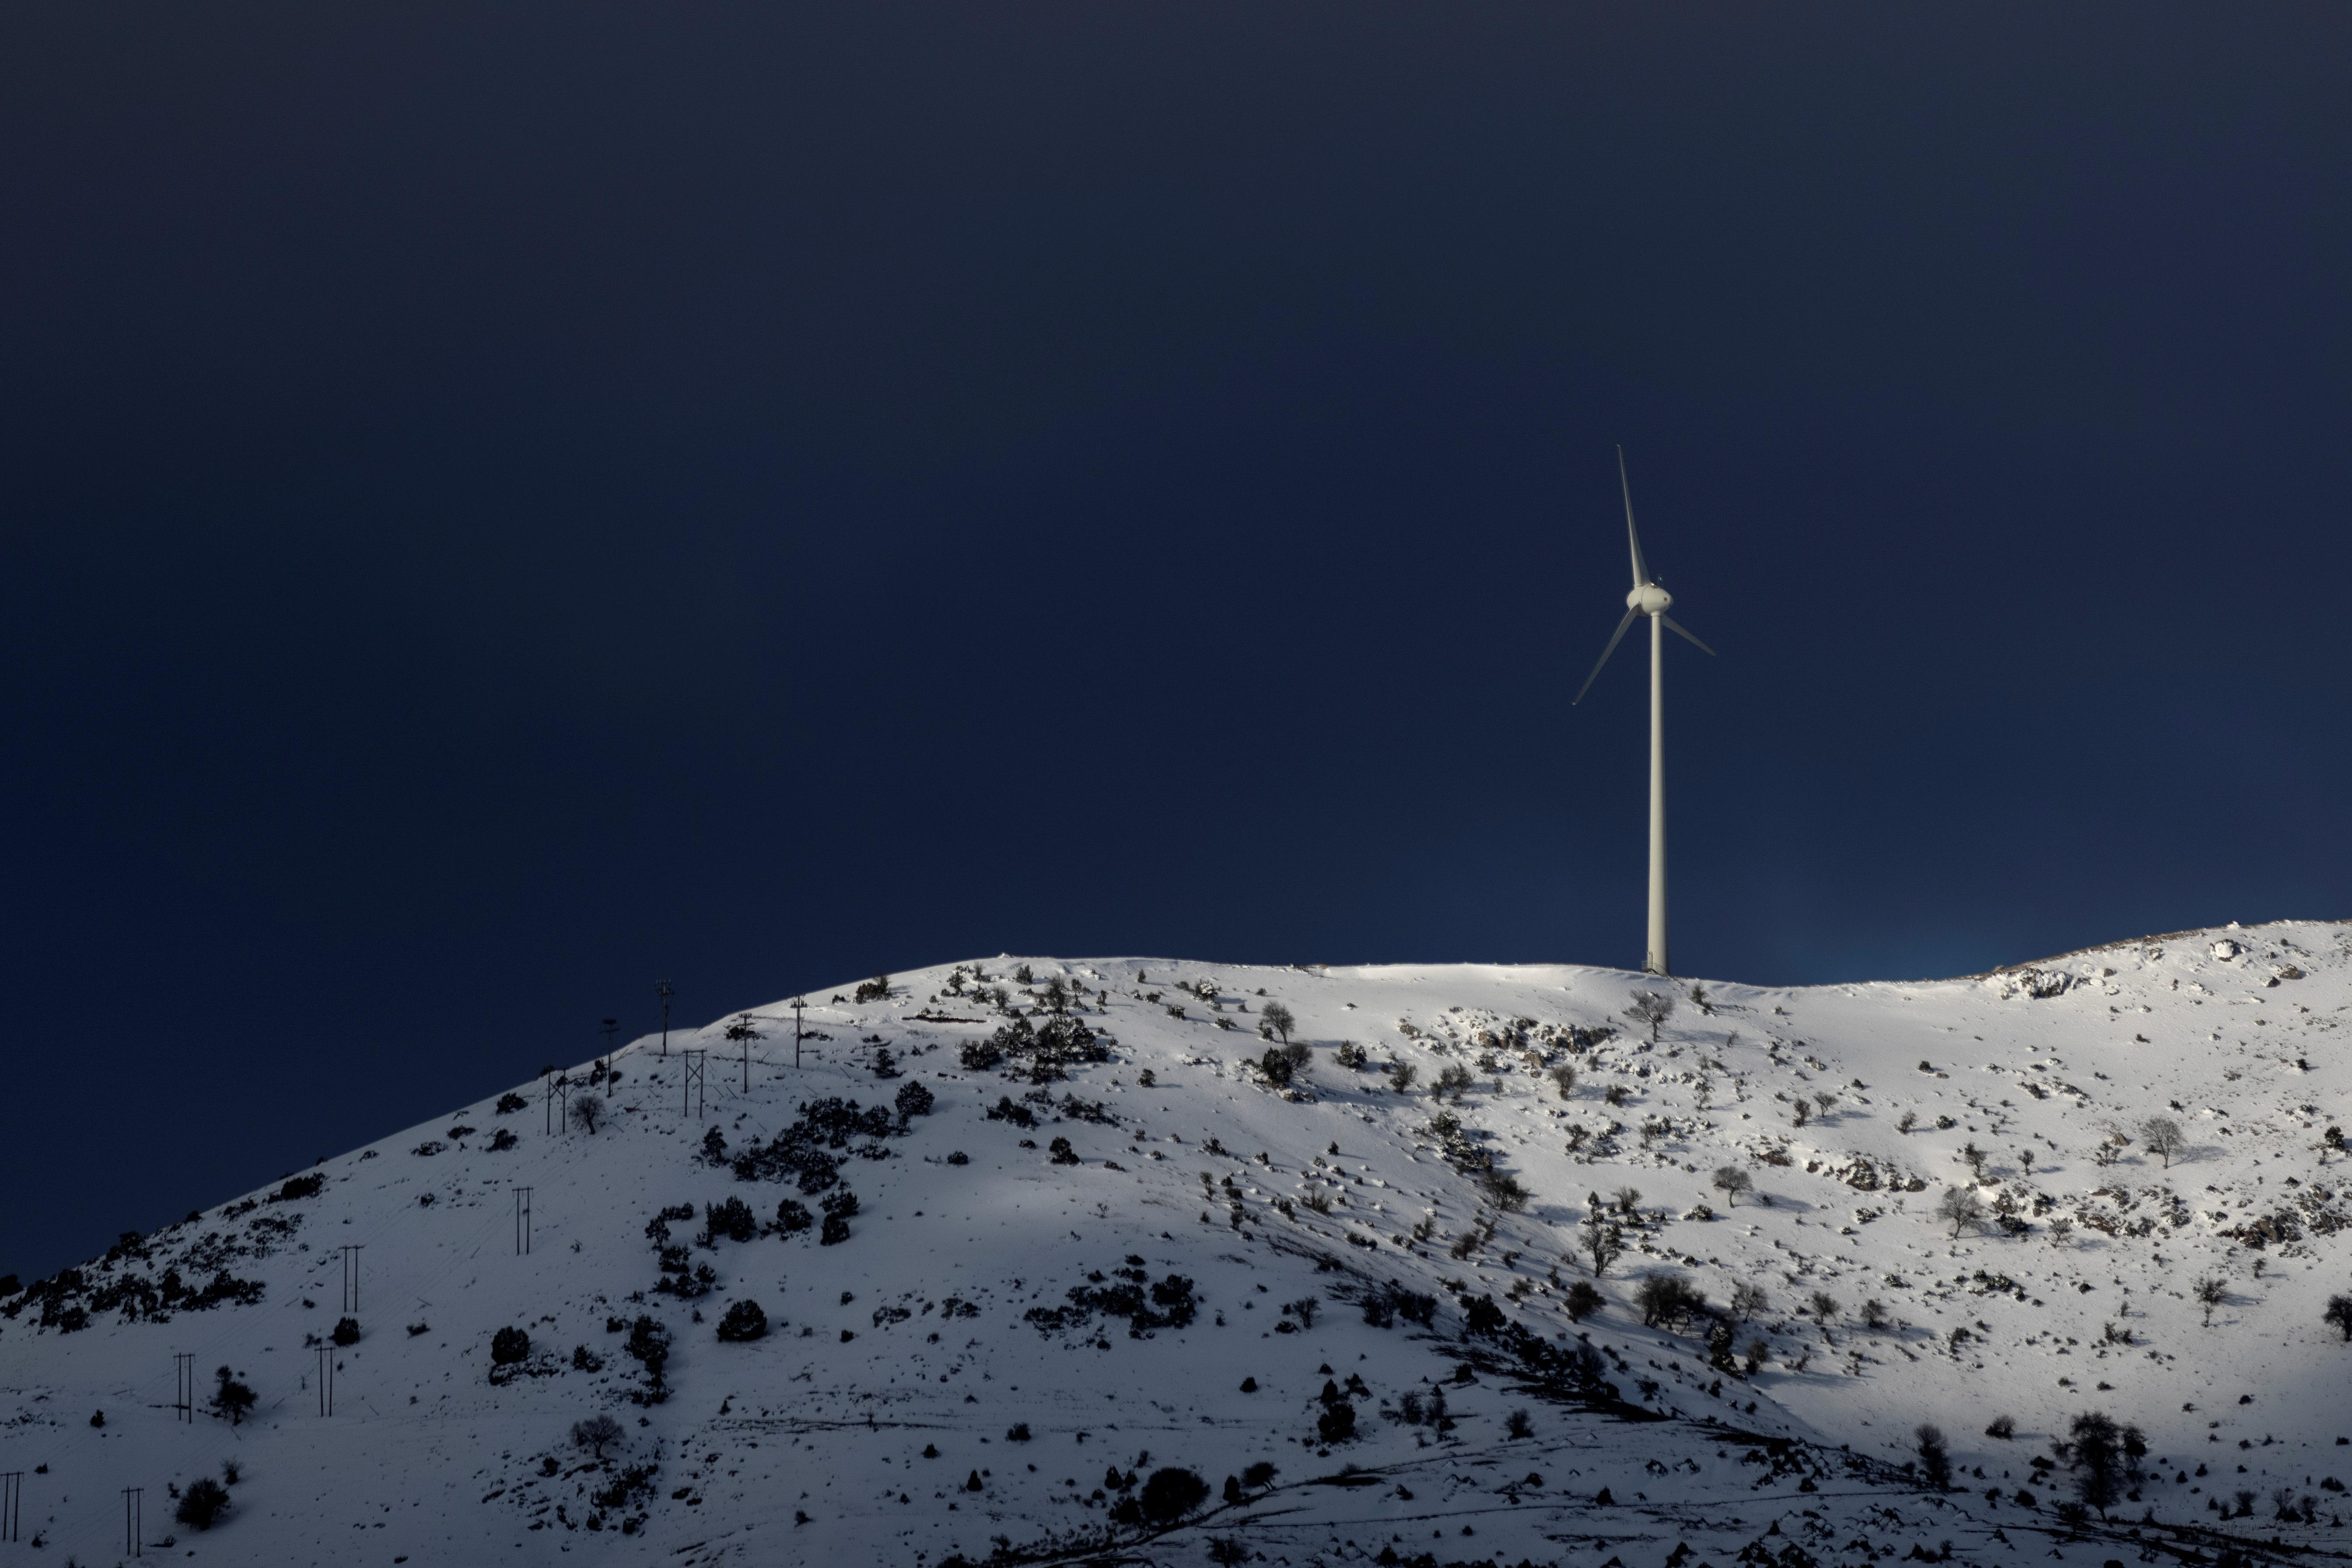 A wind turbine operates on a snowy mountain near the town of Kalavrita, Greece, March 17, 2021. REUTERS/Alkis Konstantinidis